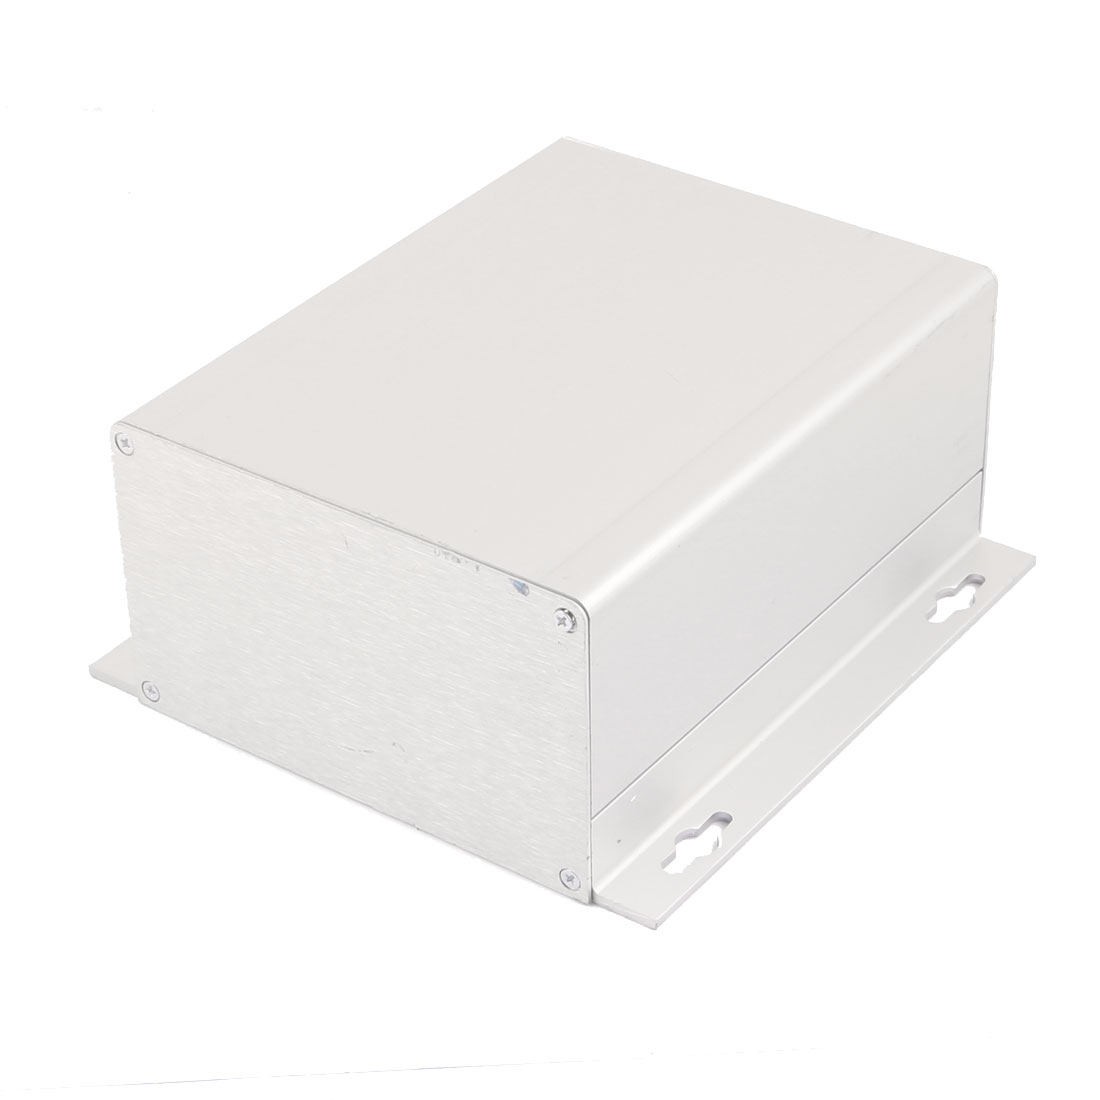 72 x 150.4 x 155mm Multi-purpose Extruded Aluminum Enclosure Box Silver Tone